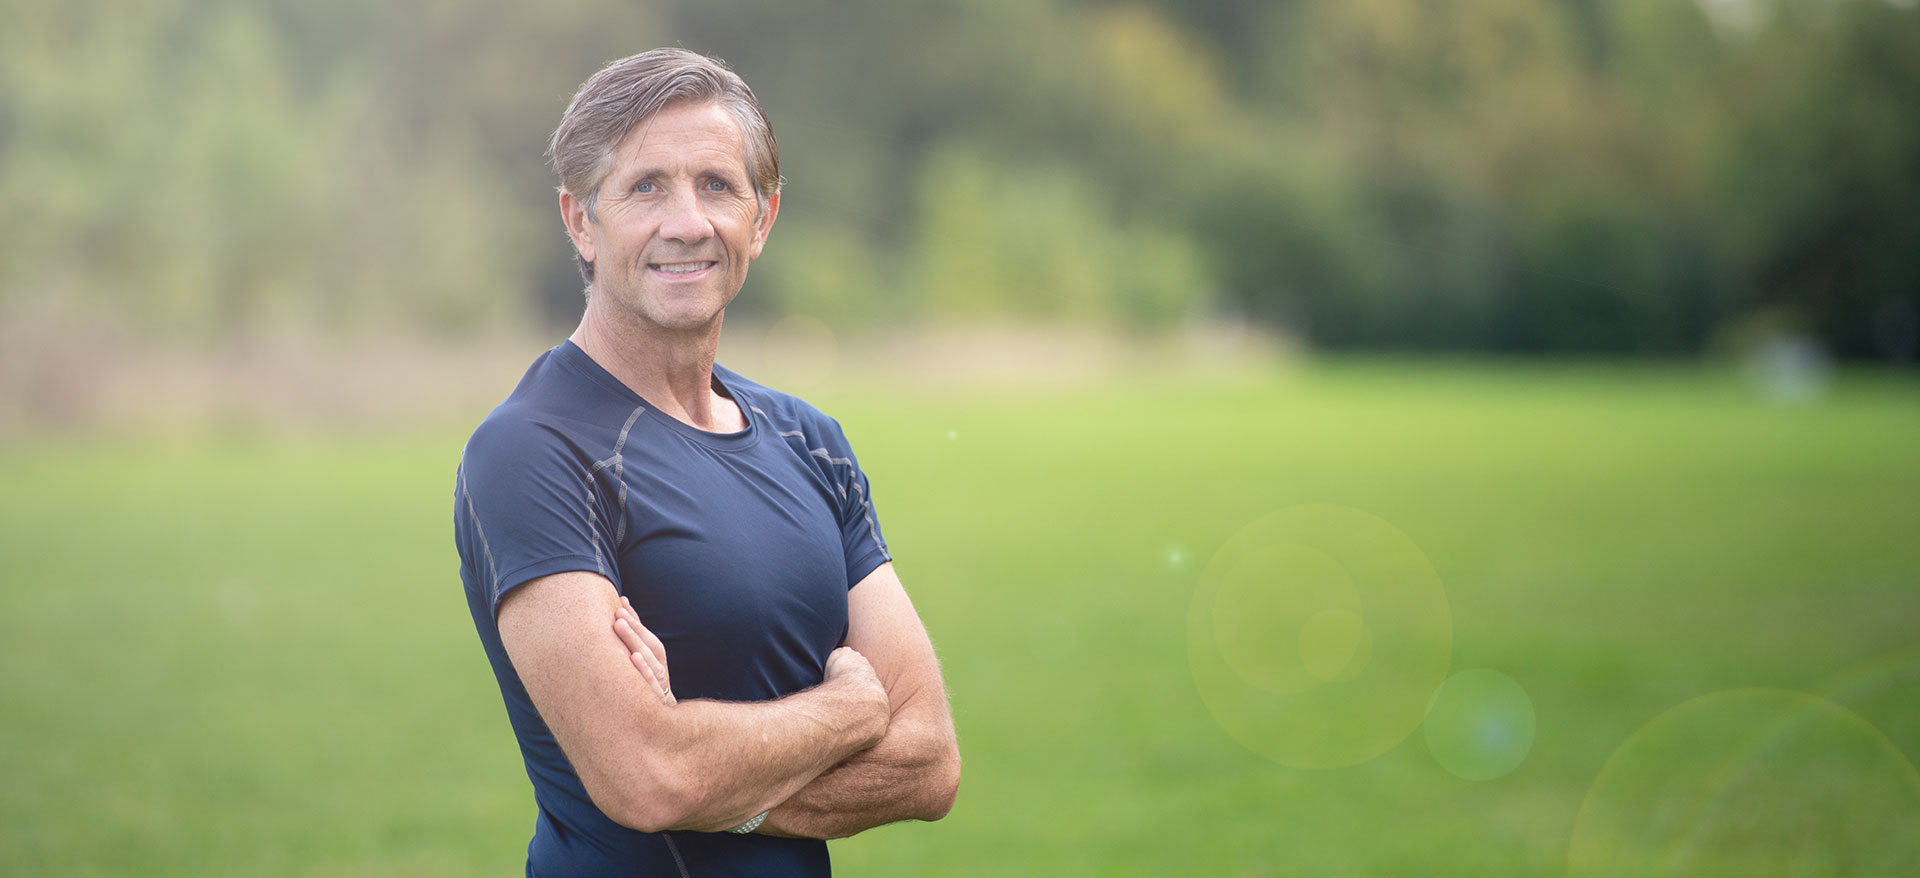 Braintree Personal Trainer